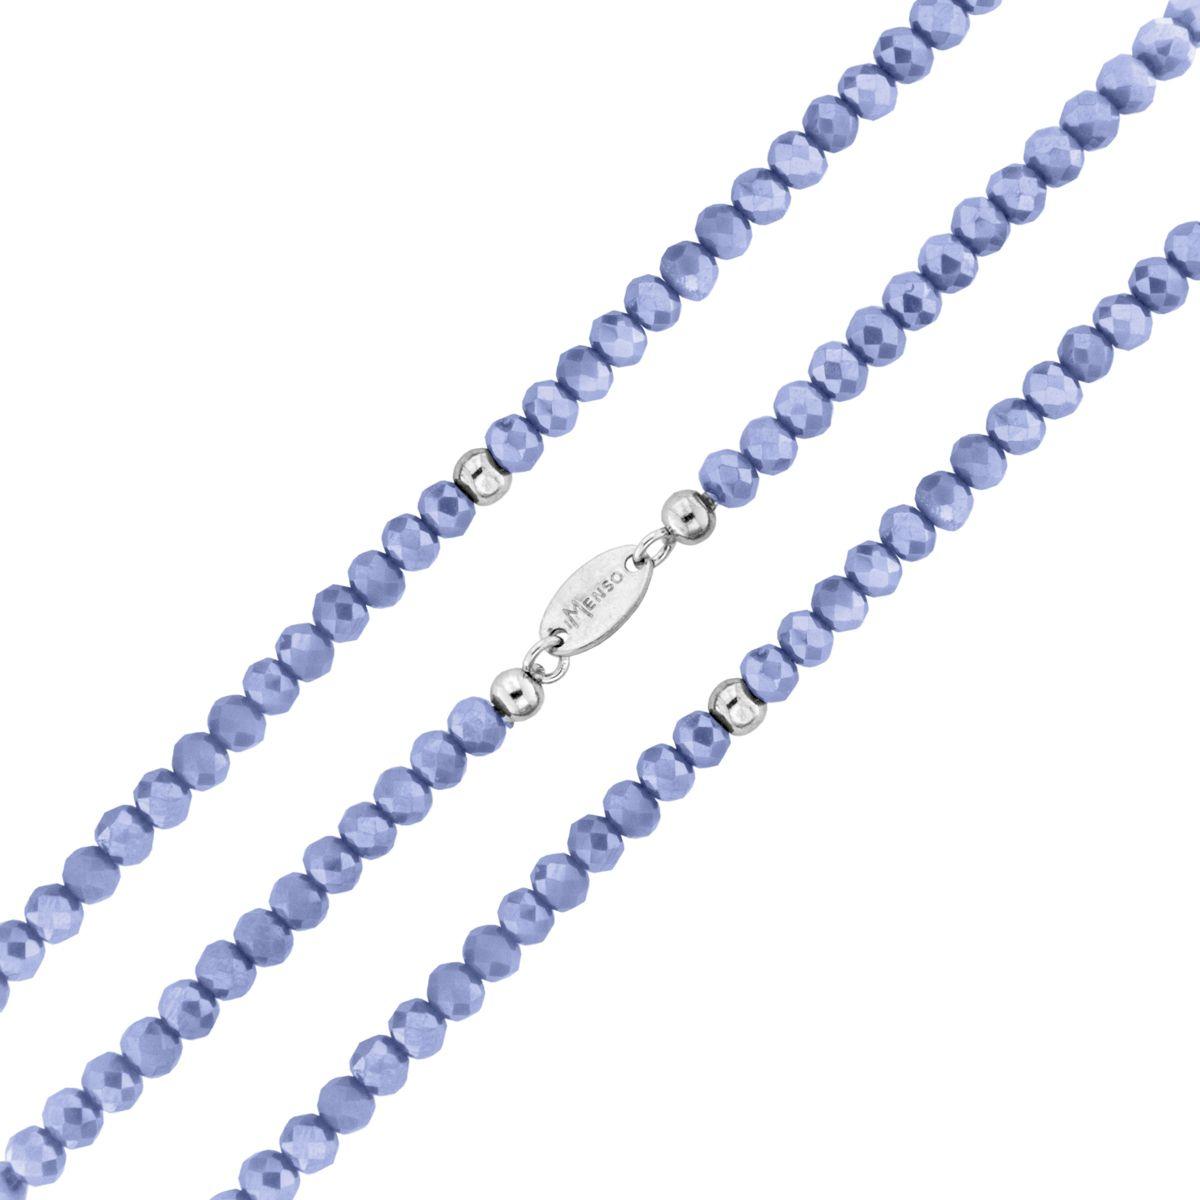 MY iMenso Wickelarmband mit Süßwasserperlen